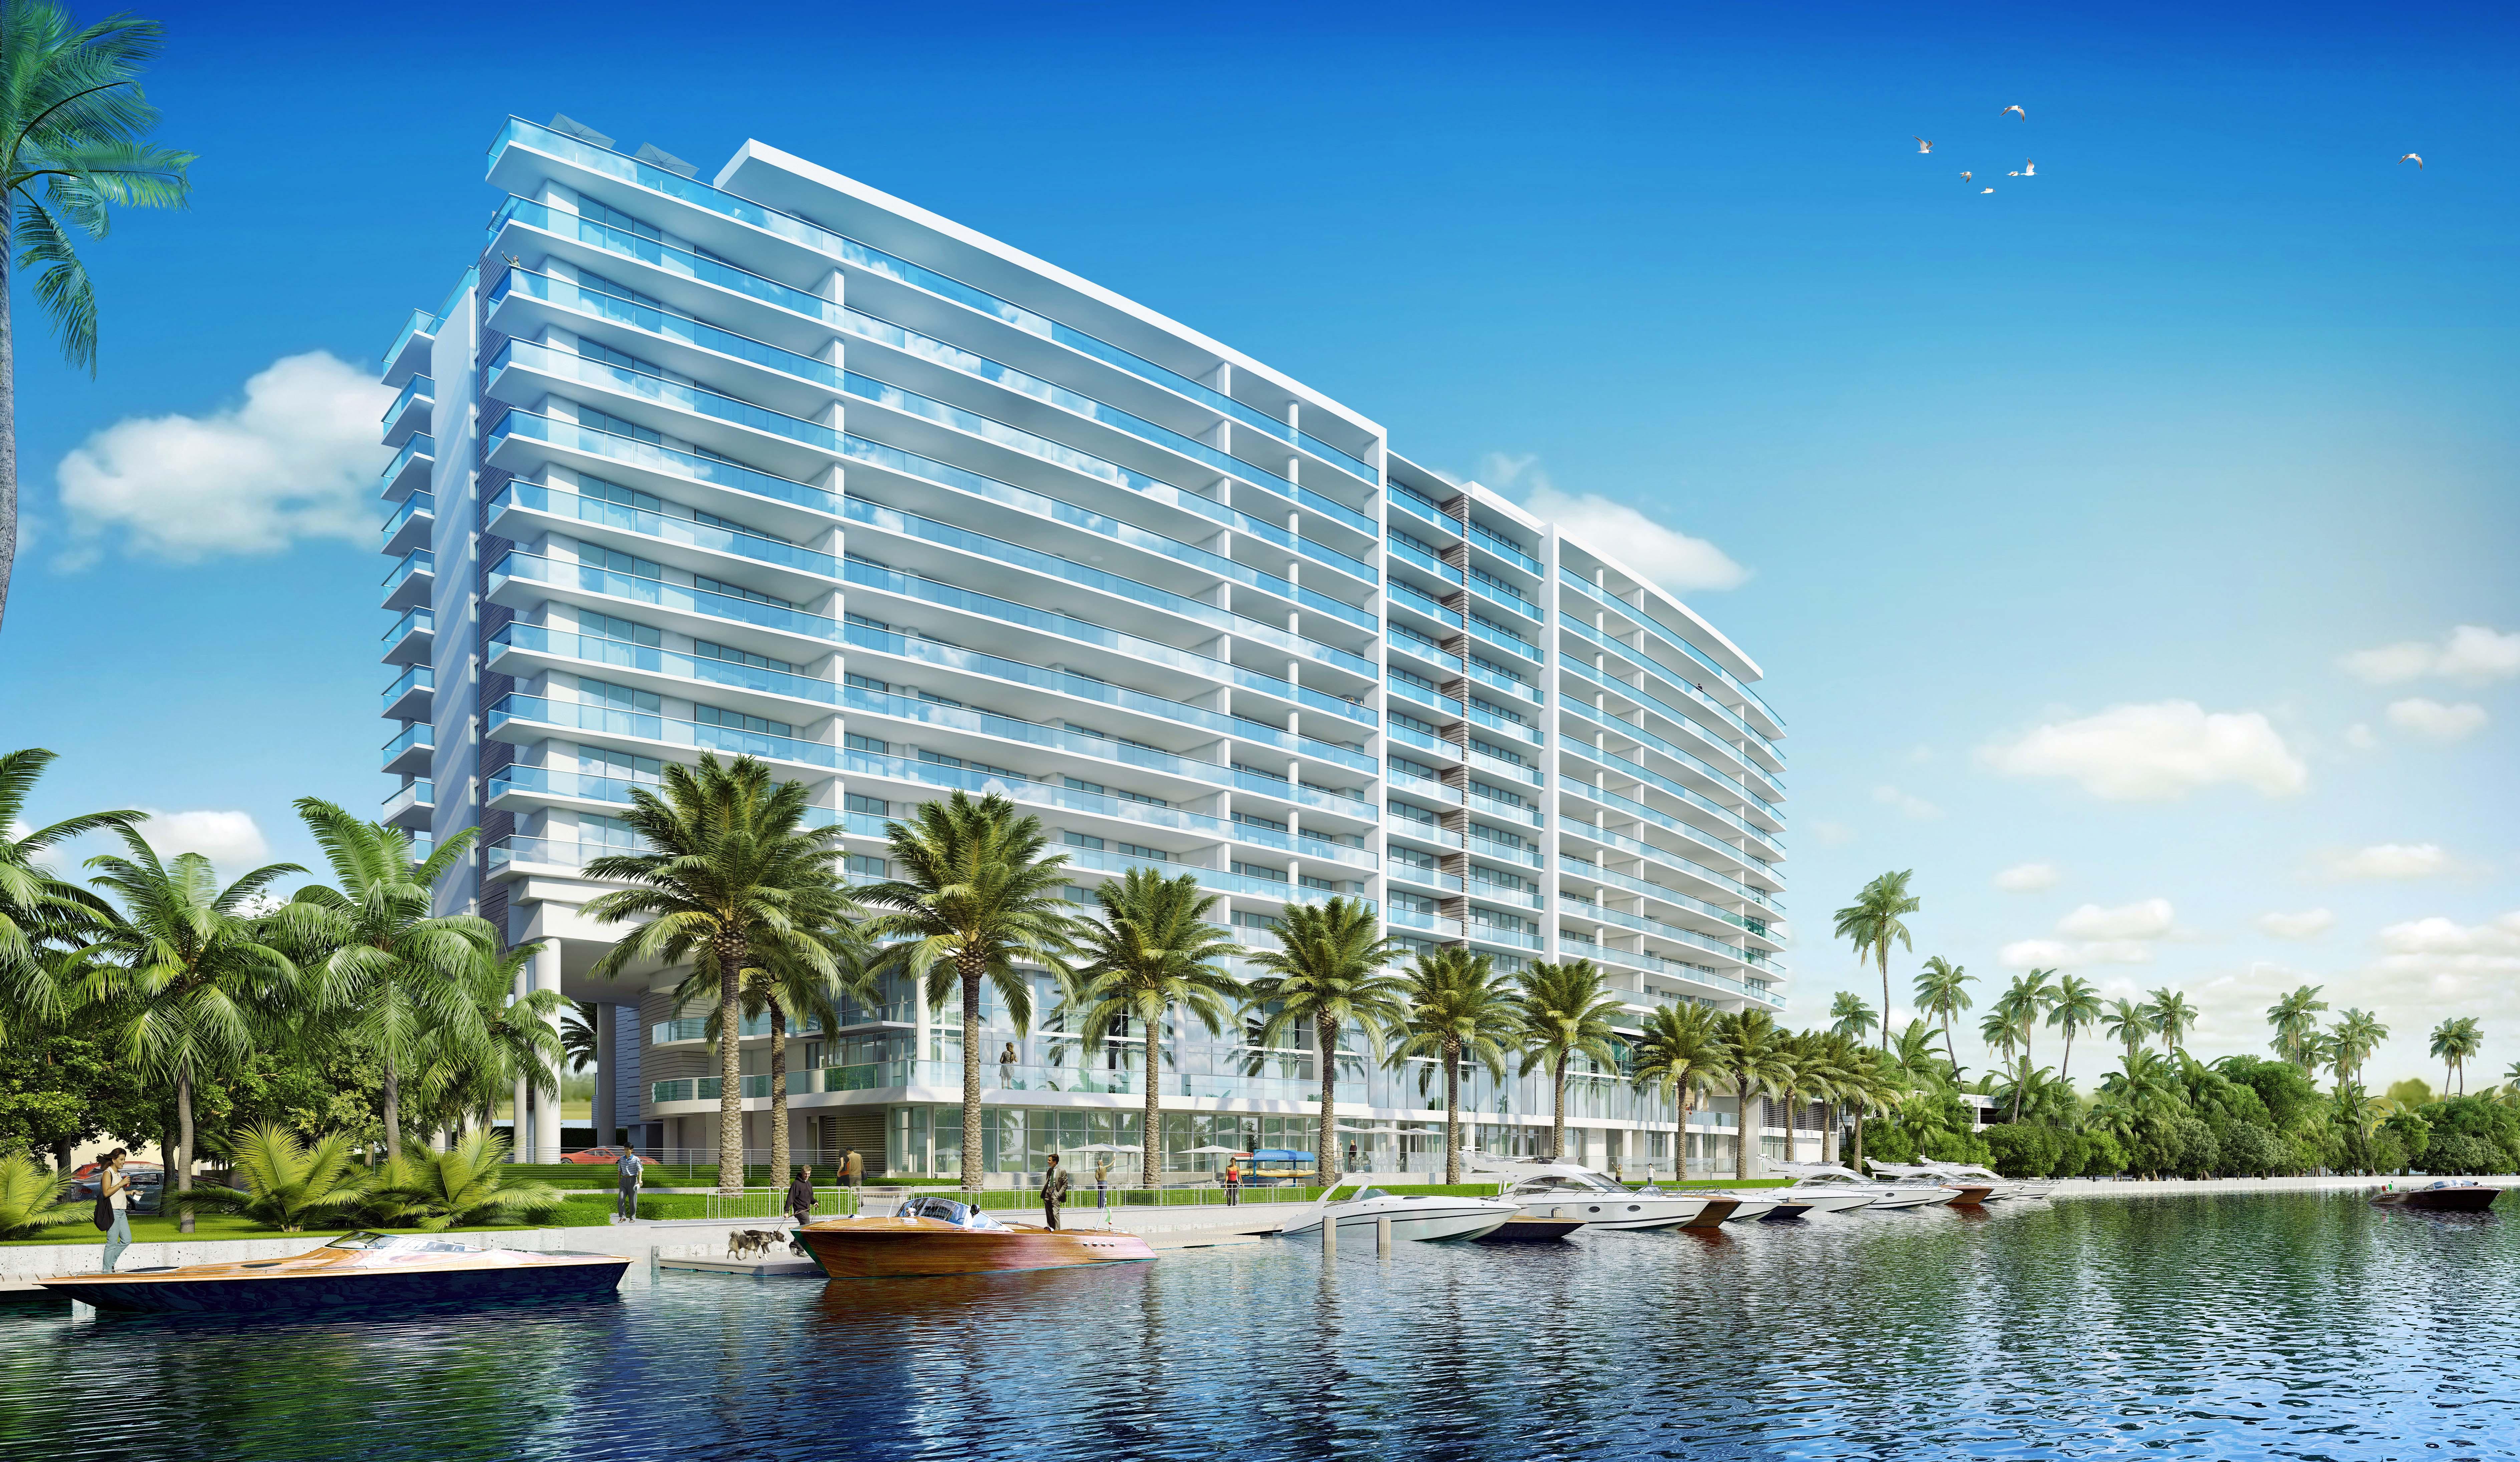 Appartement pour l Vente à 1180 N Federal Hwy #703 1180 N Federal Hwy 703 Fort Lauderdale, Florida, 33304 États-Unis